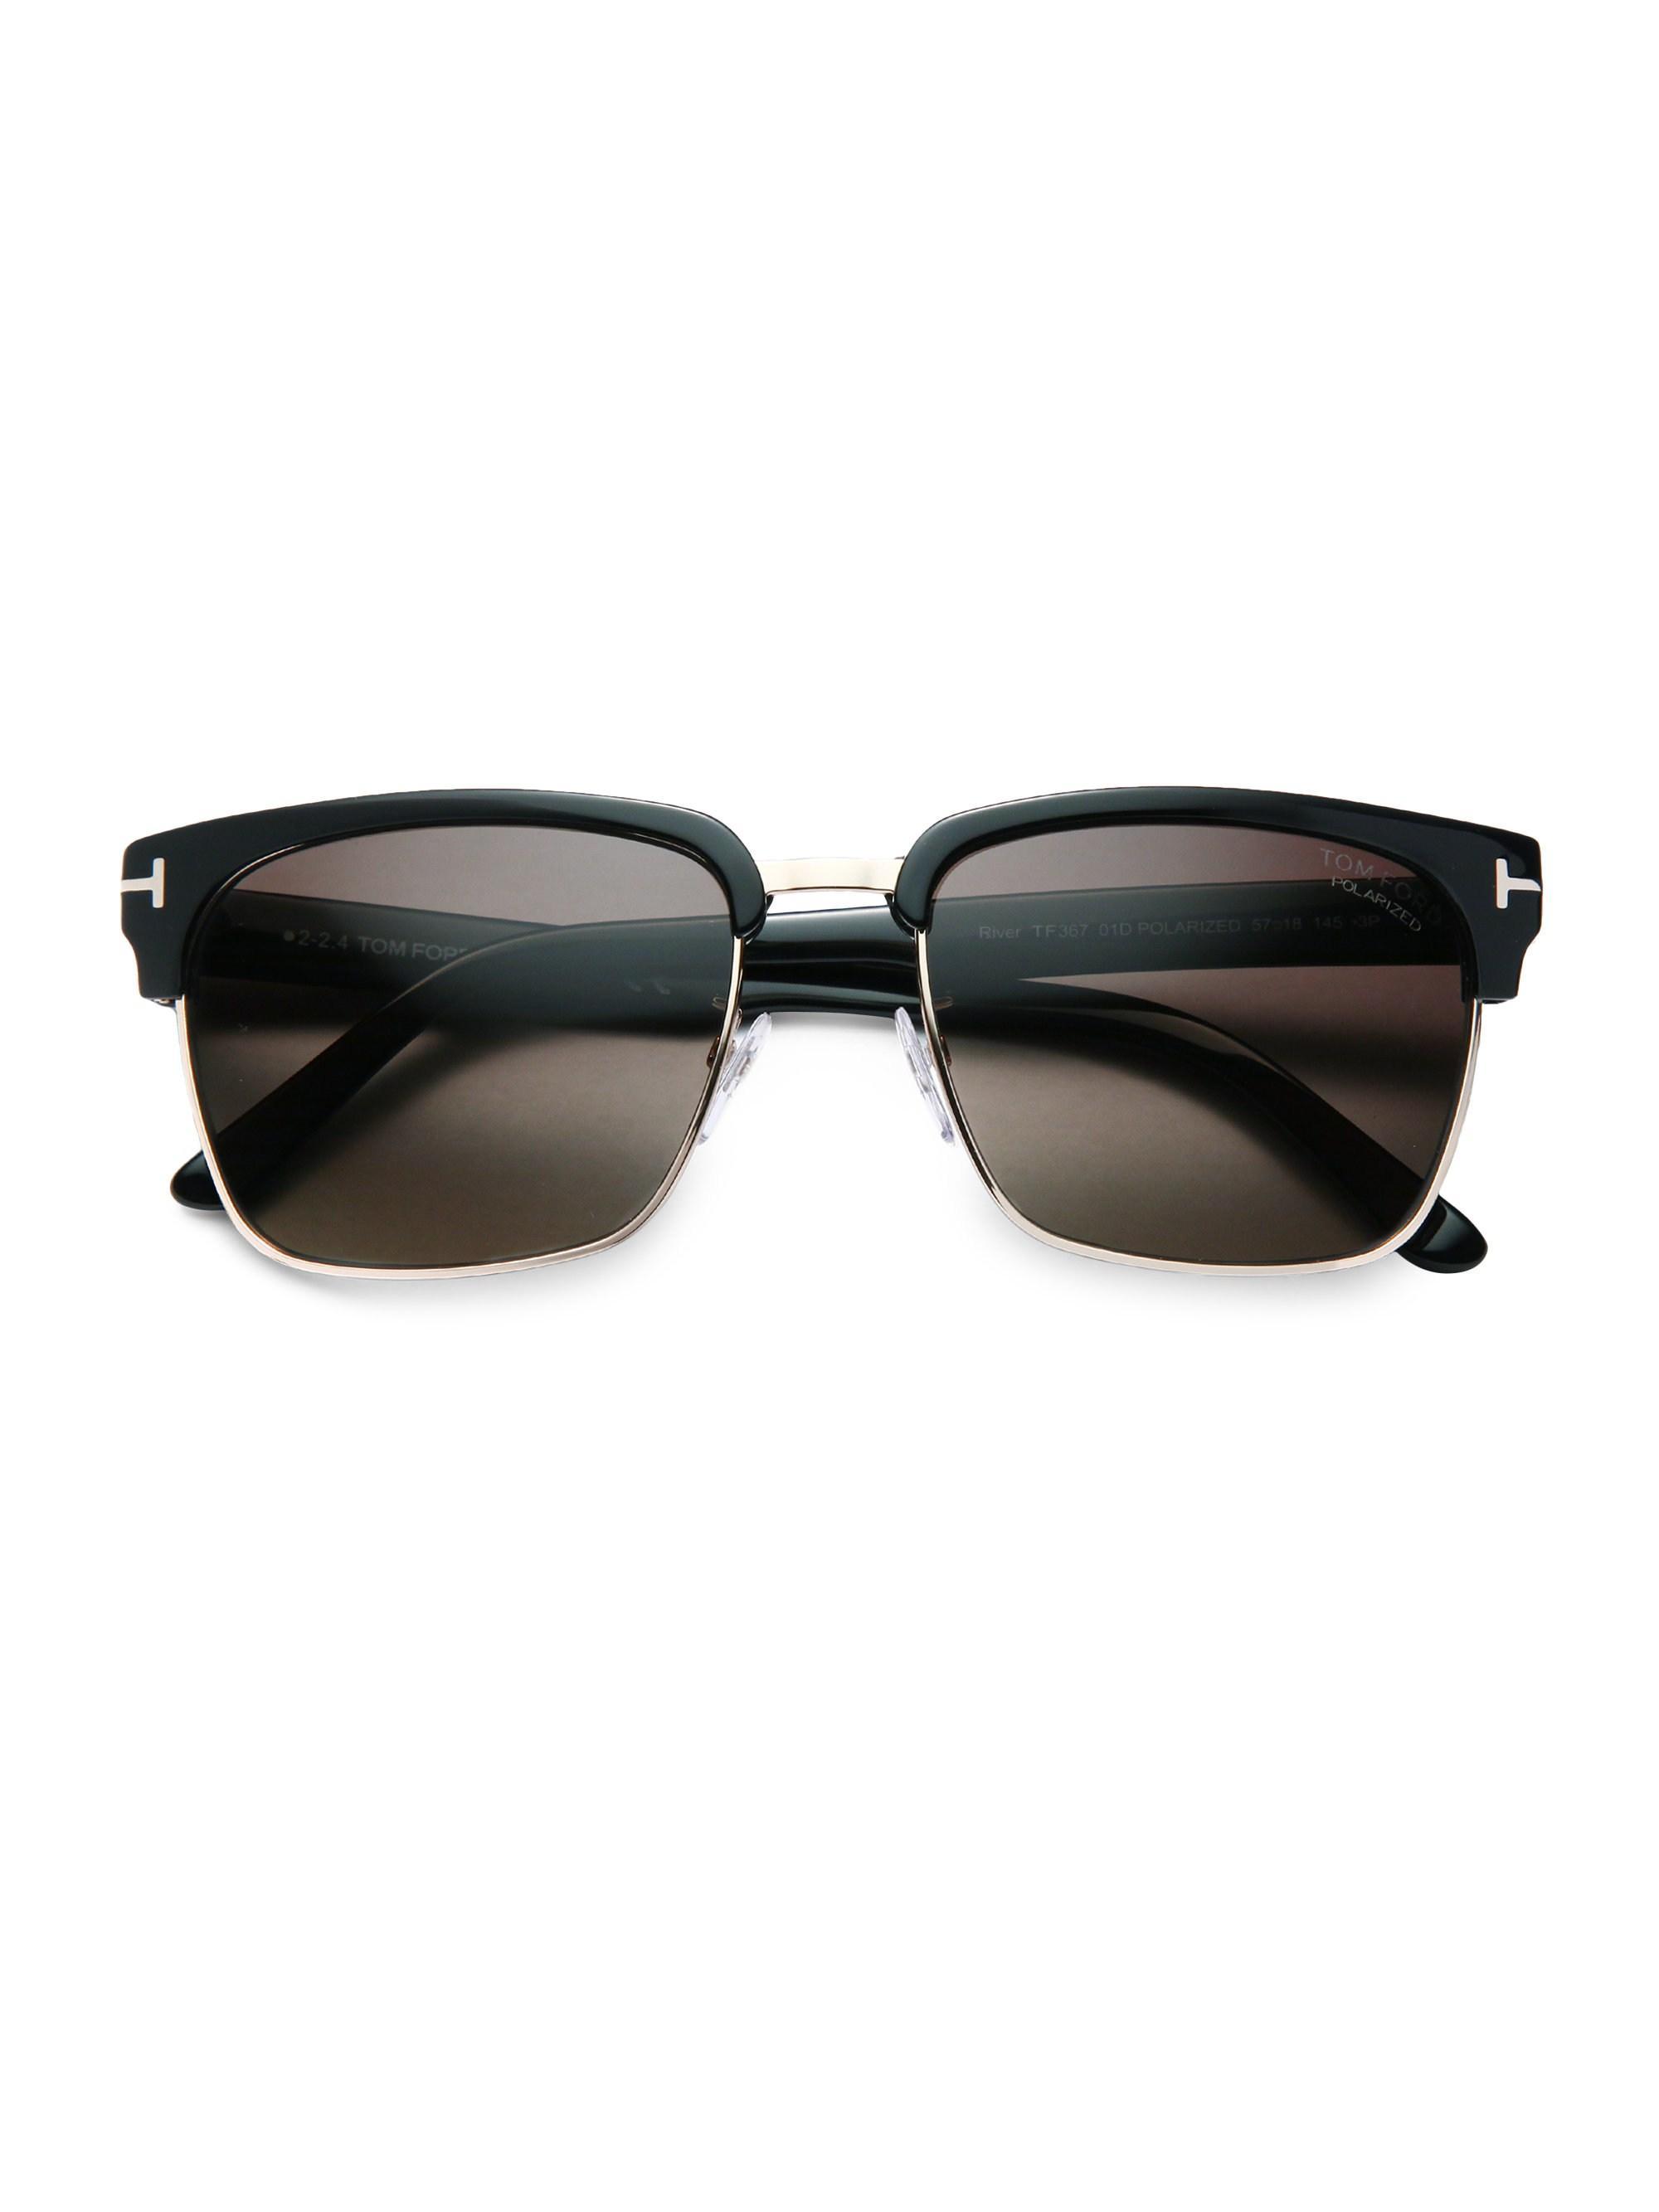 3216bdb75afbe Tom Ford Men s River 57mm Square Sunglasses - Black in Black for Men ...